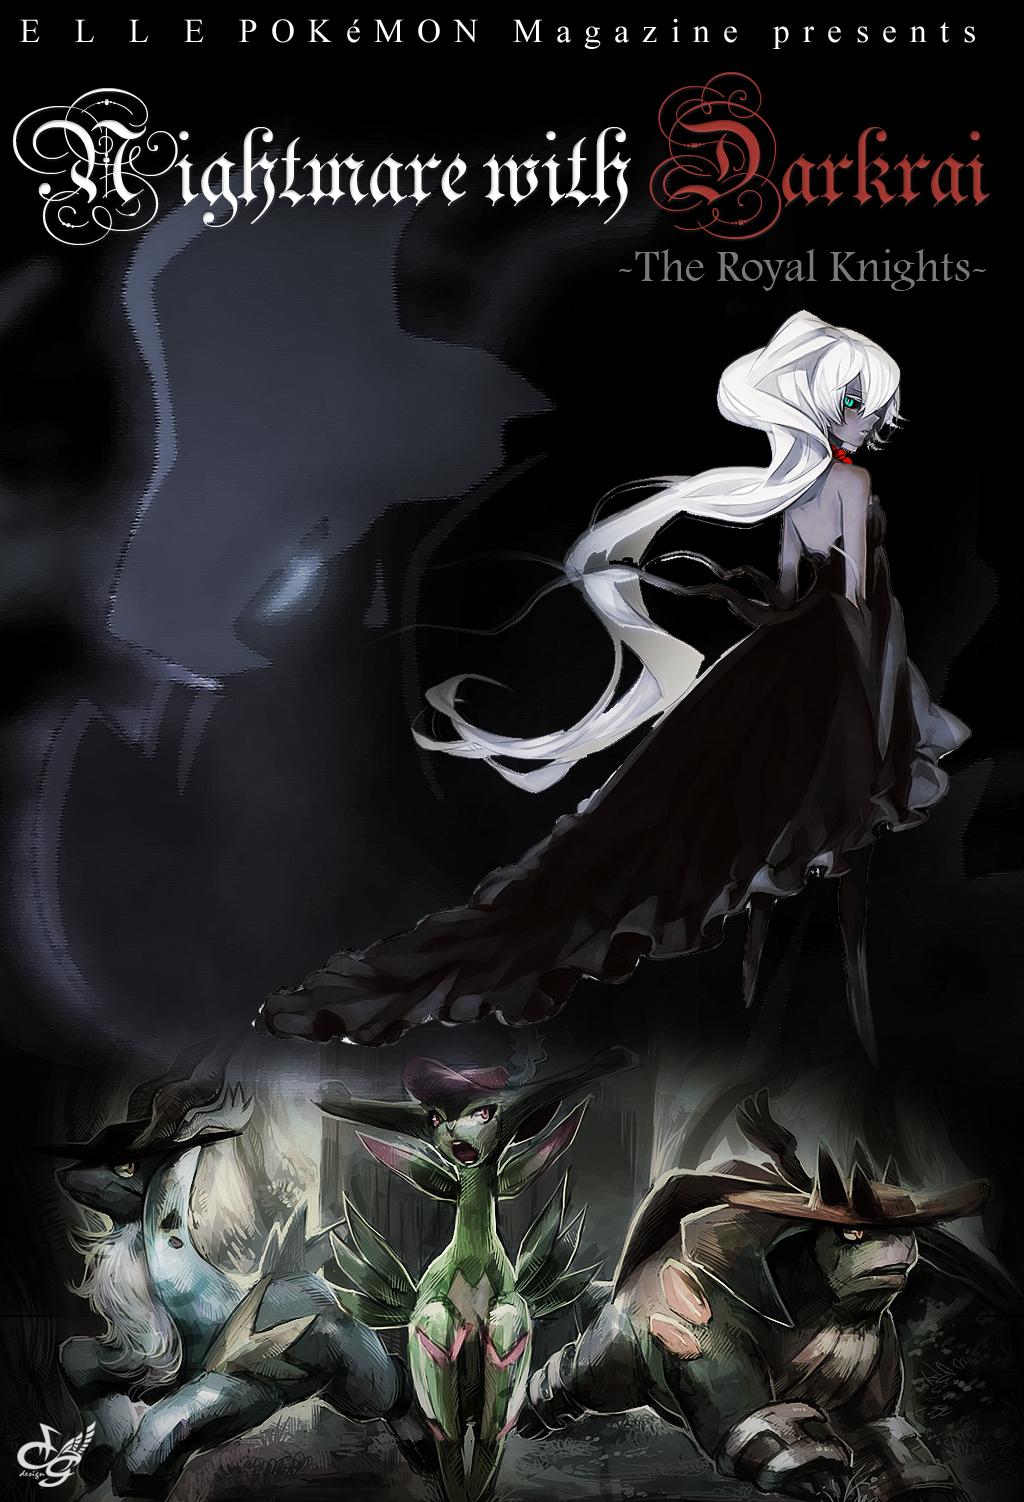 """Nightmare With Darkrai"" -The Royal Knights-: Villainy"